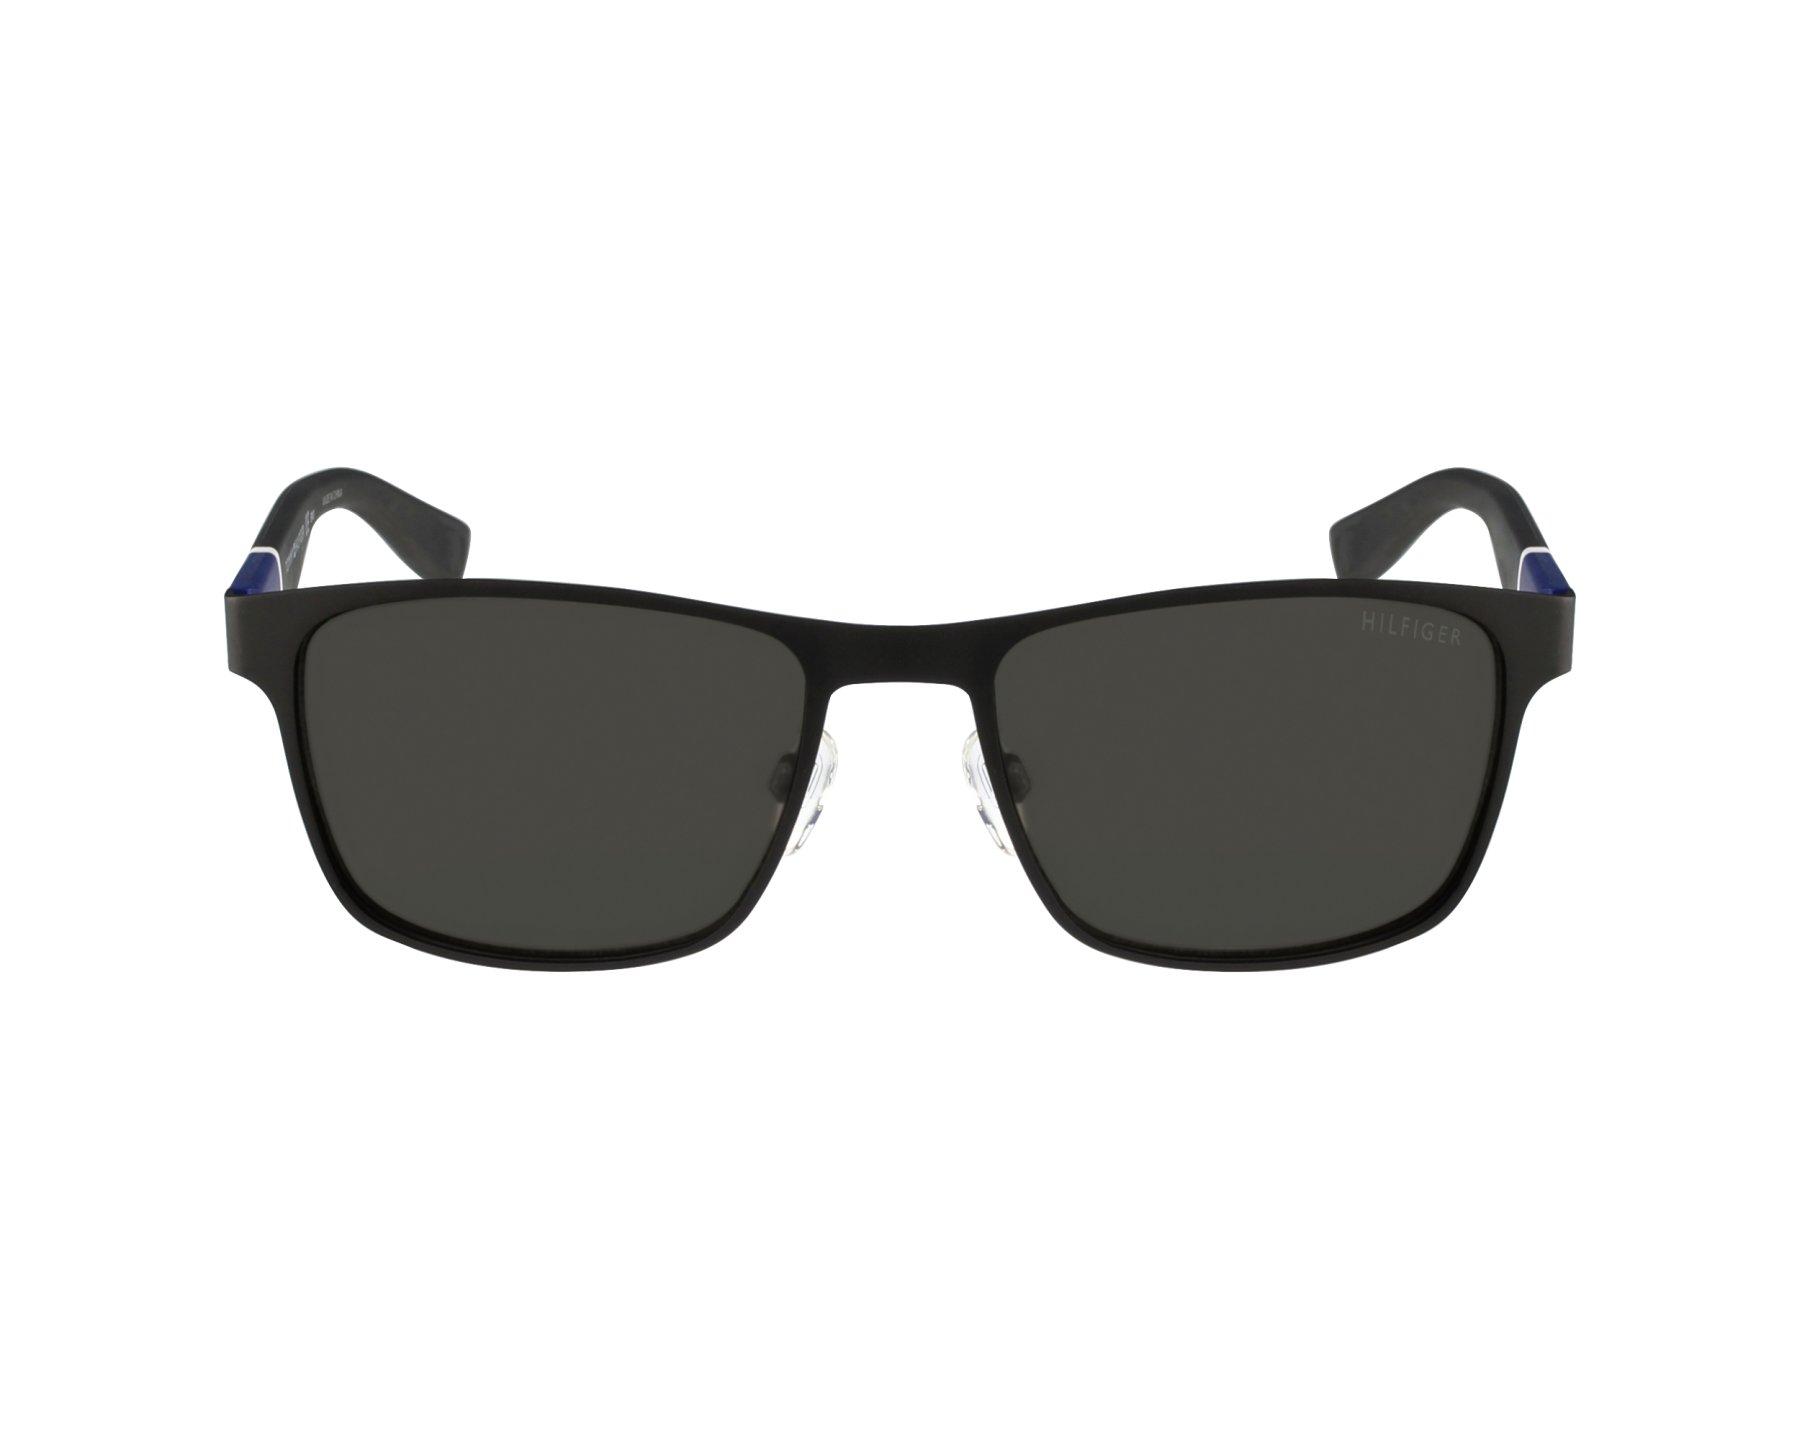 4a0e740351 Sunglasses Tommy Hilfiger TH-1283-S FO3 NR - Black Blue profile view